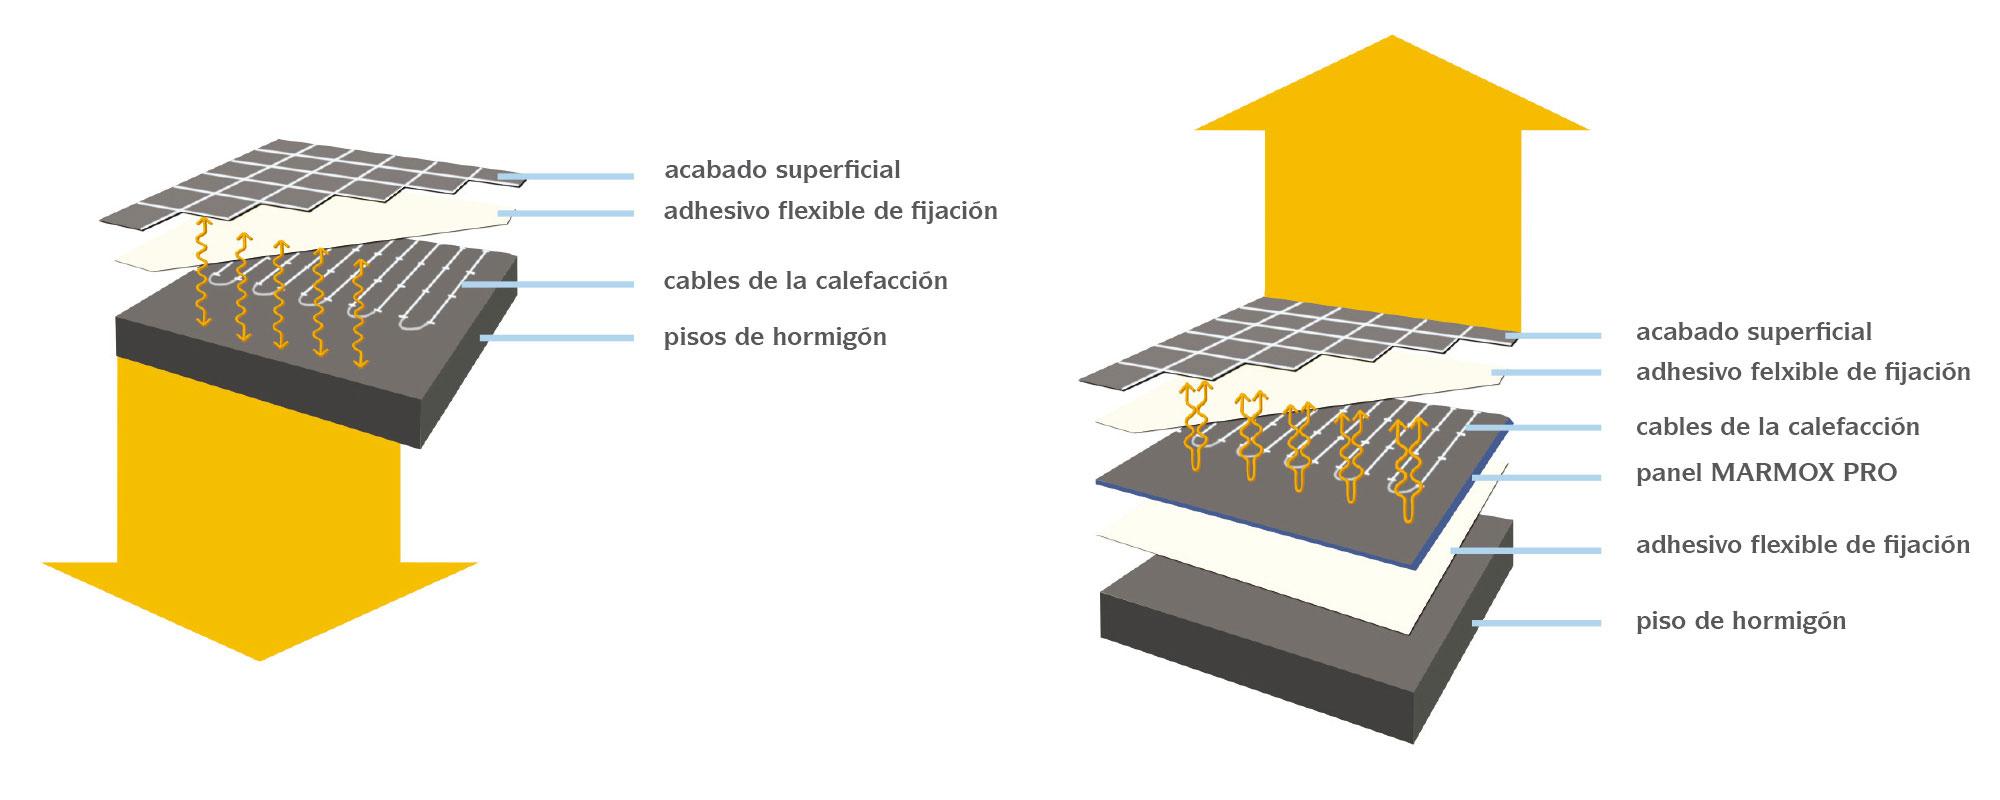 Calefaccion electrica por calefaccion electrica por with - Calefaccion radiante electrica ...